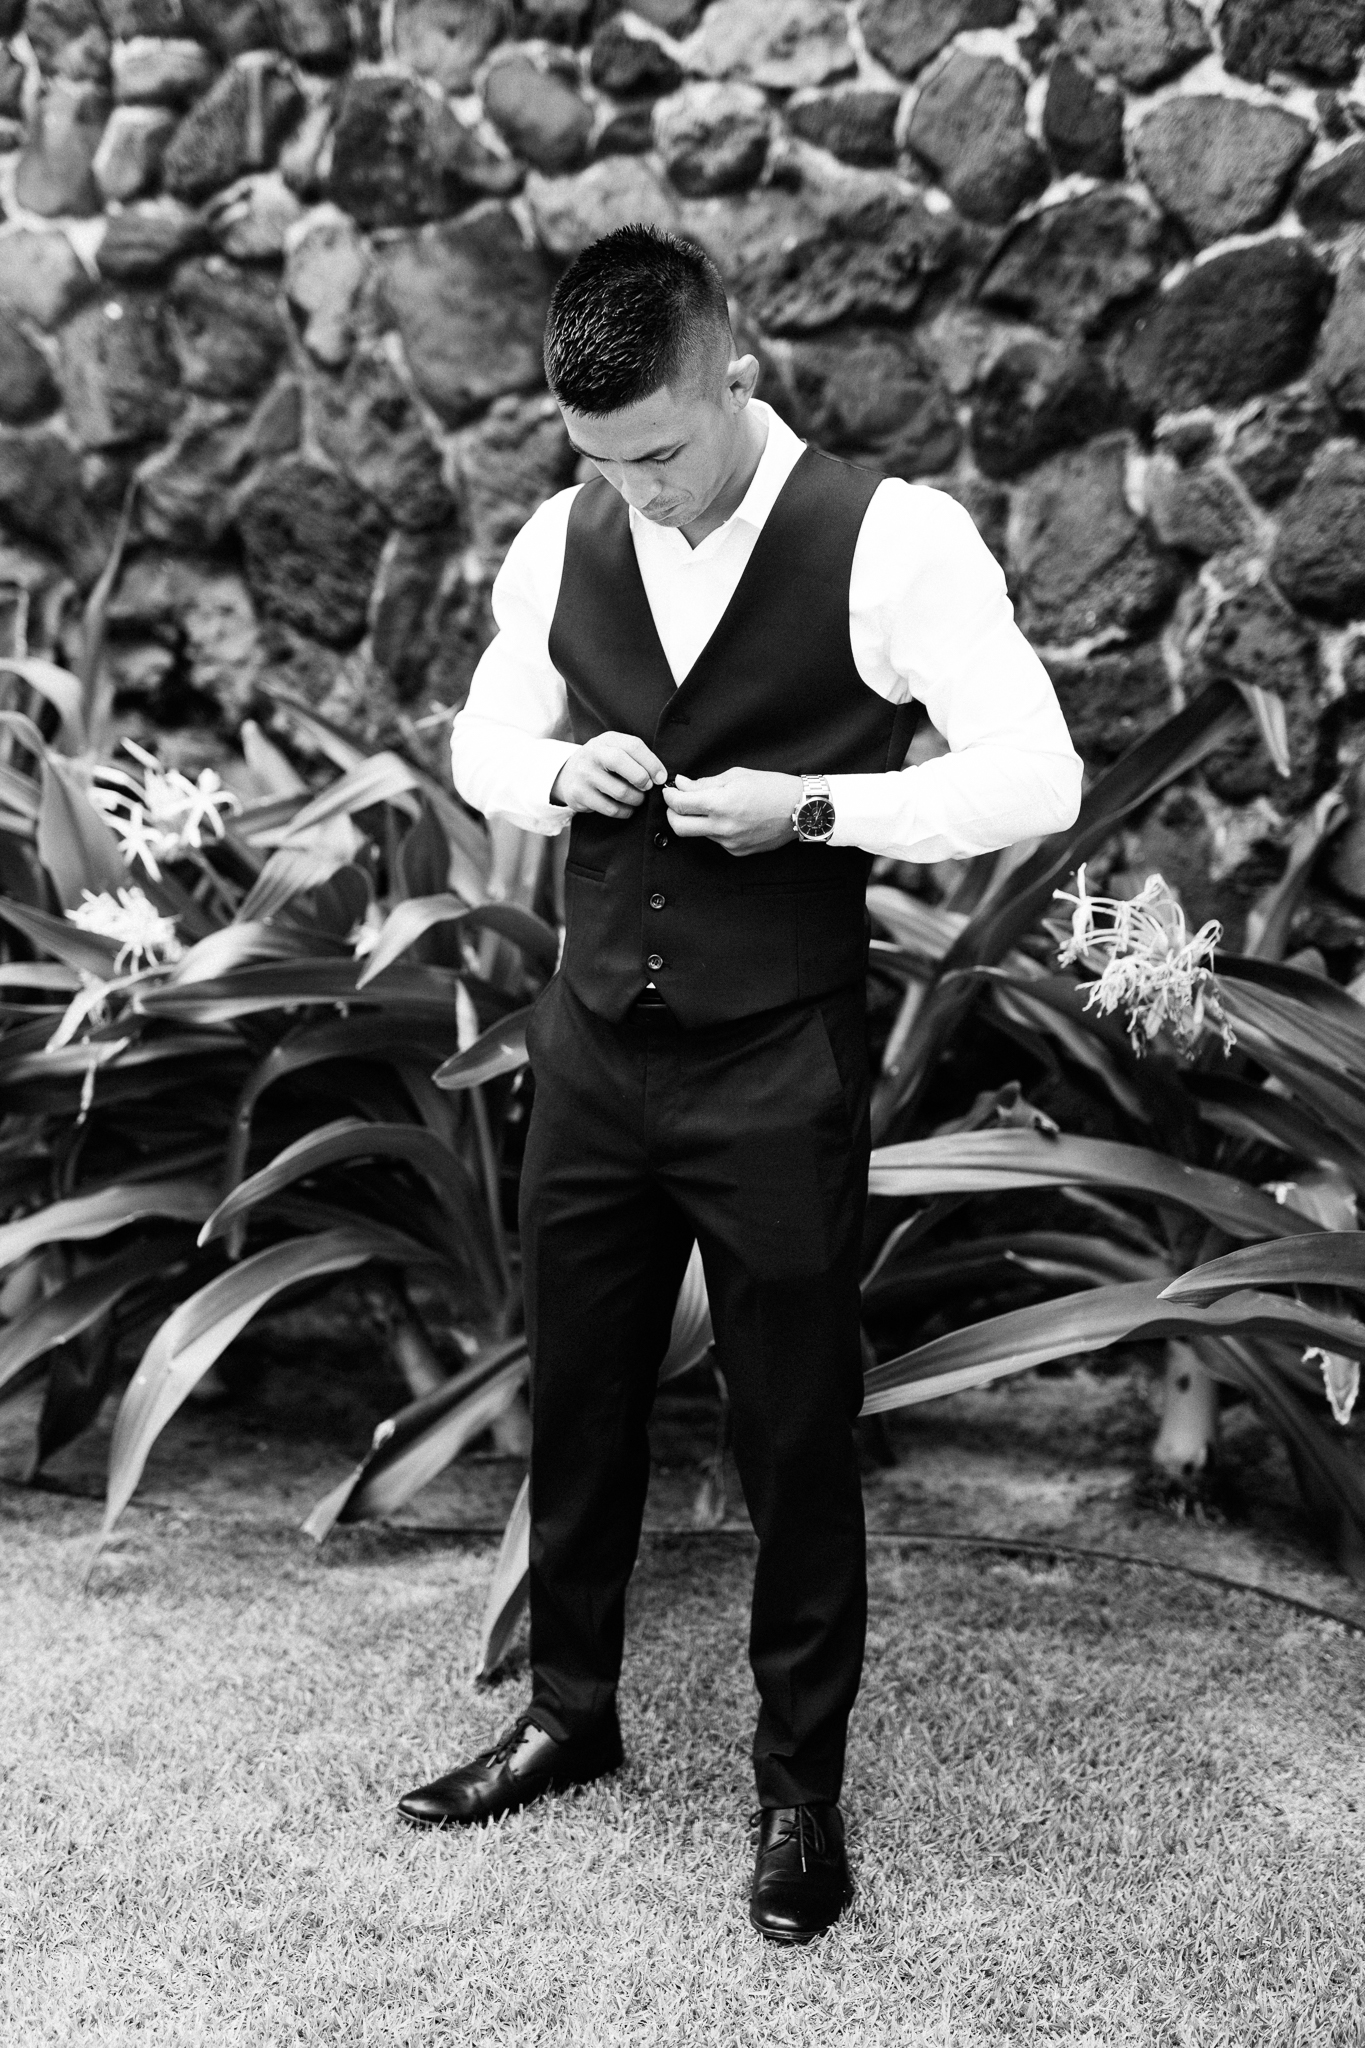 Kualoa_Ranch_Wedding_Photographer_Tone_Hawaii-7.jpg